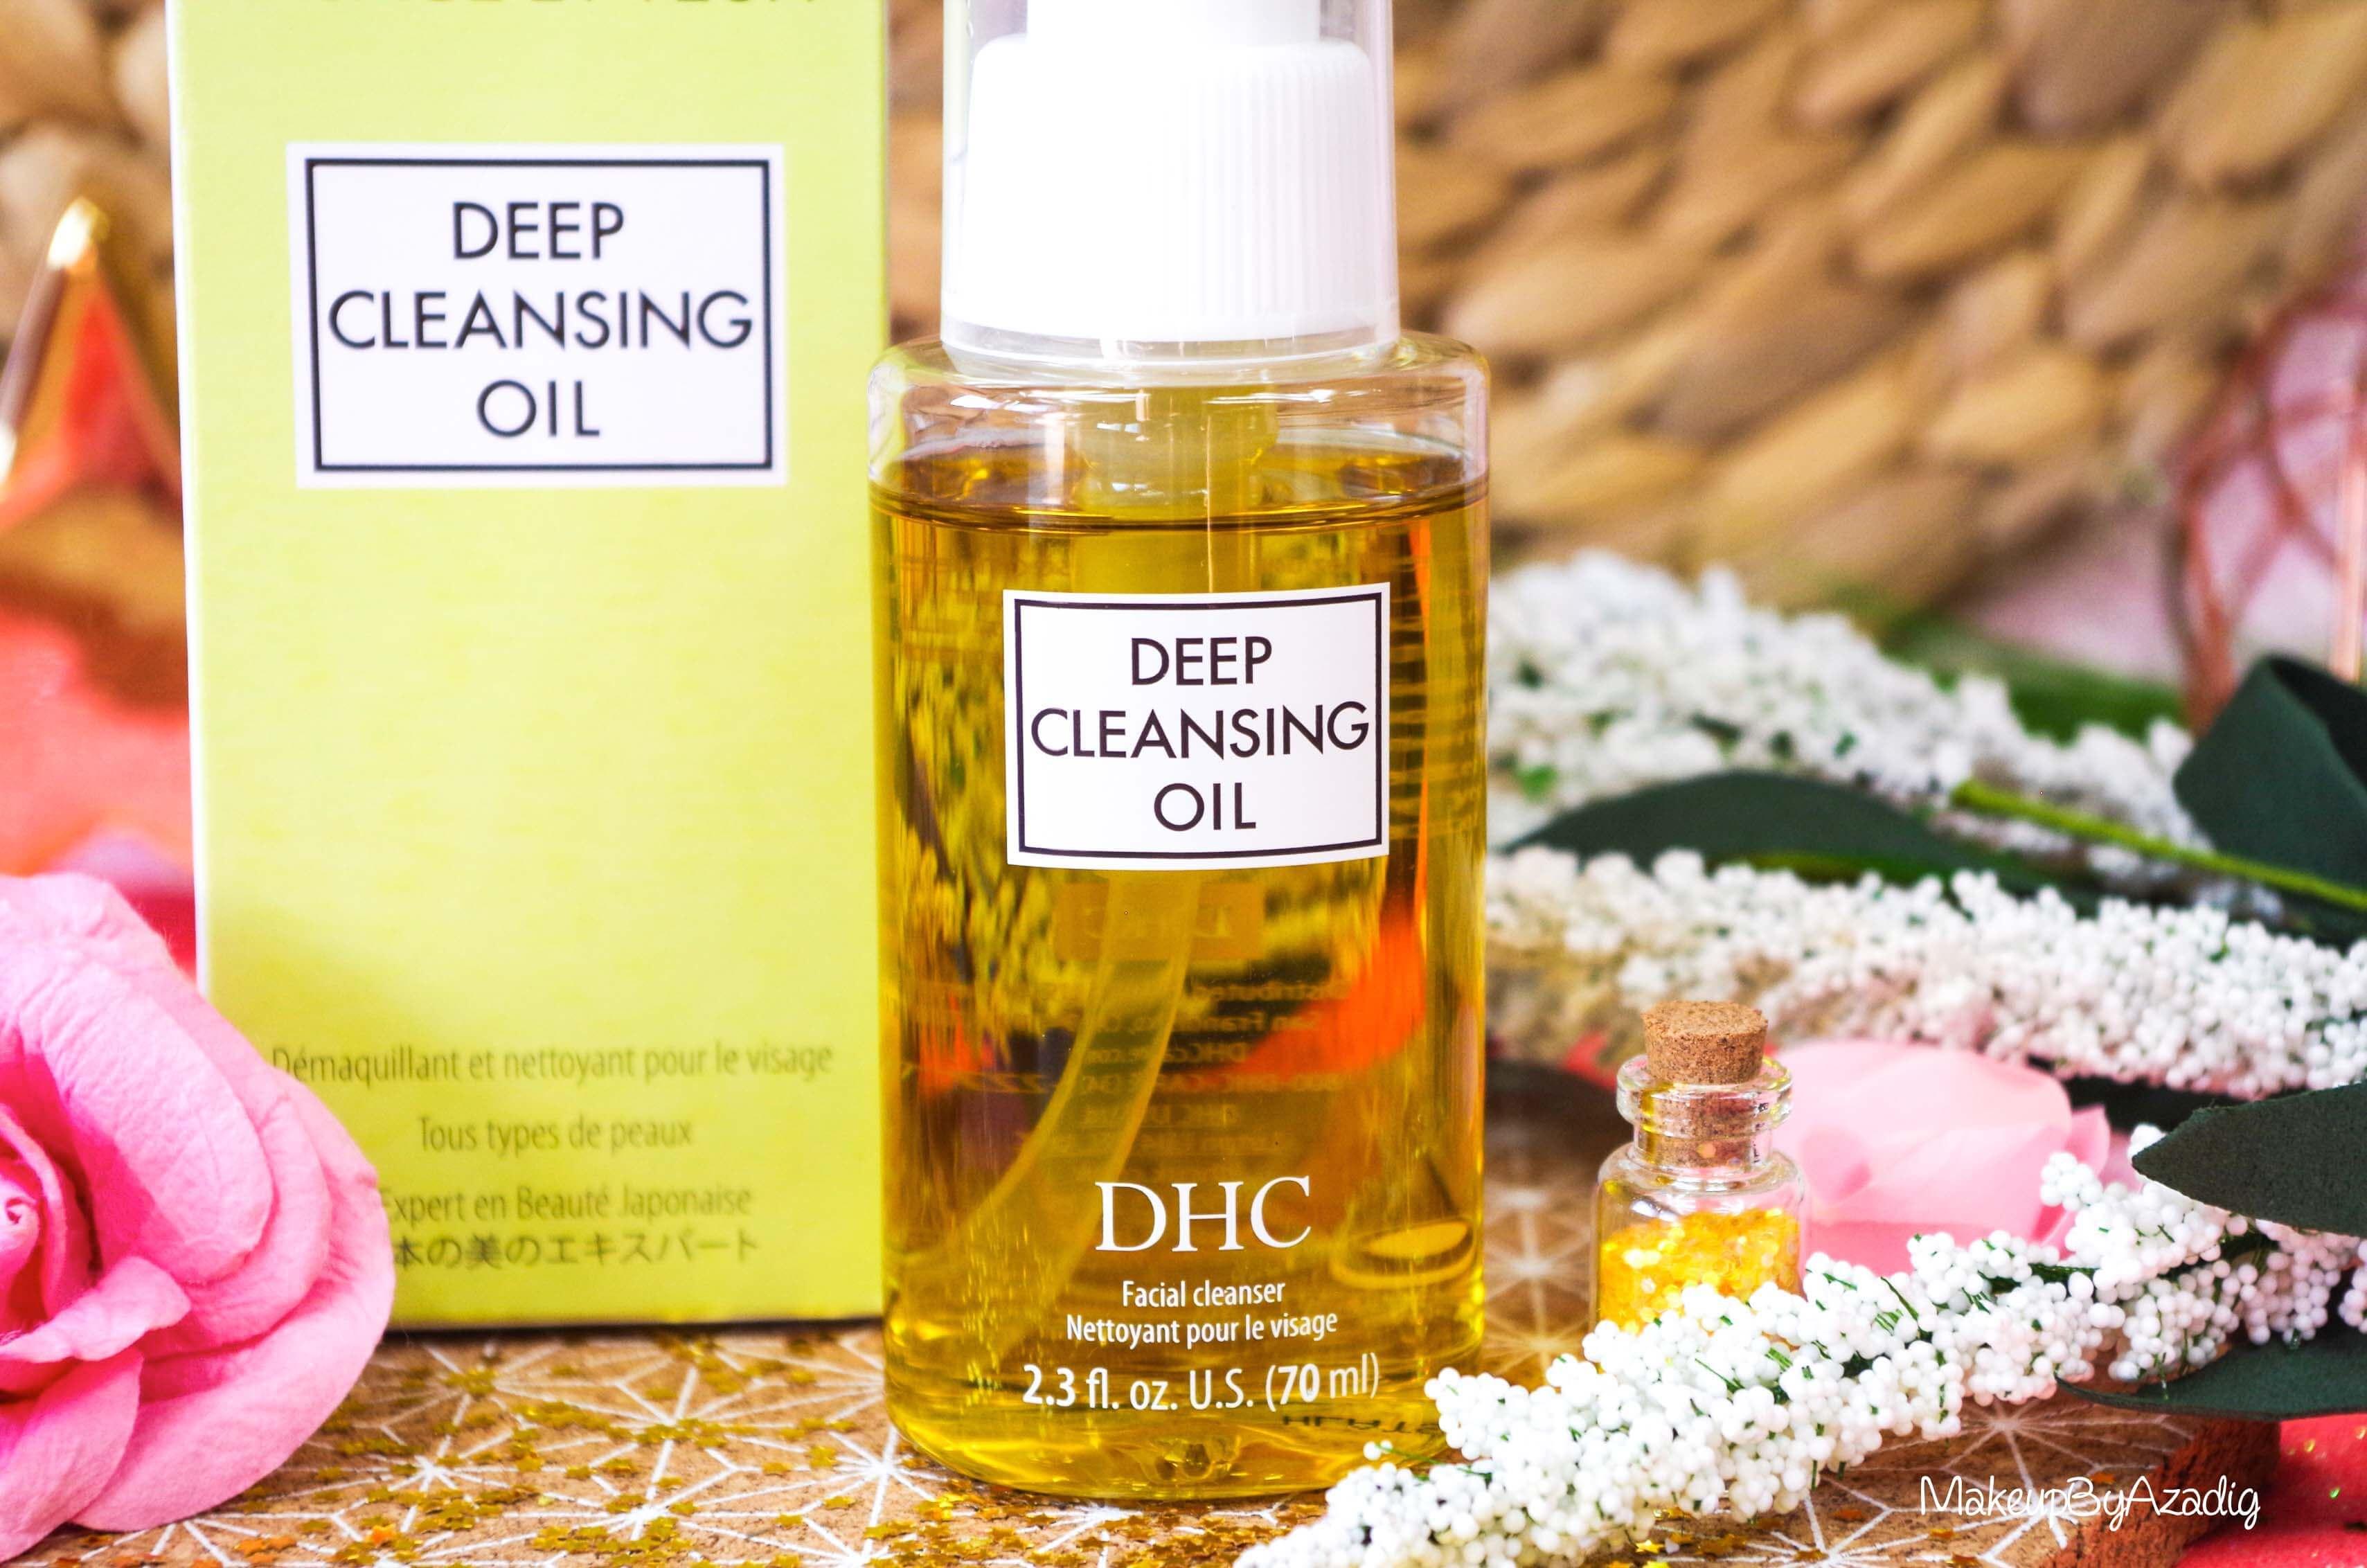 revue-review-huile-demaquillante-deep-cleansing-oil-dhc-meilleure-avis-prix-nocibe-monoprix-makeupbyazadig-zoom